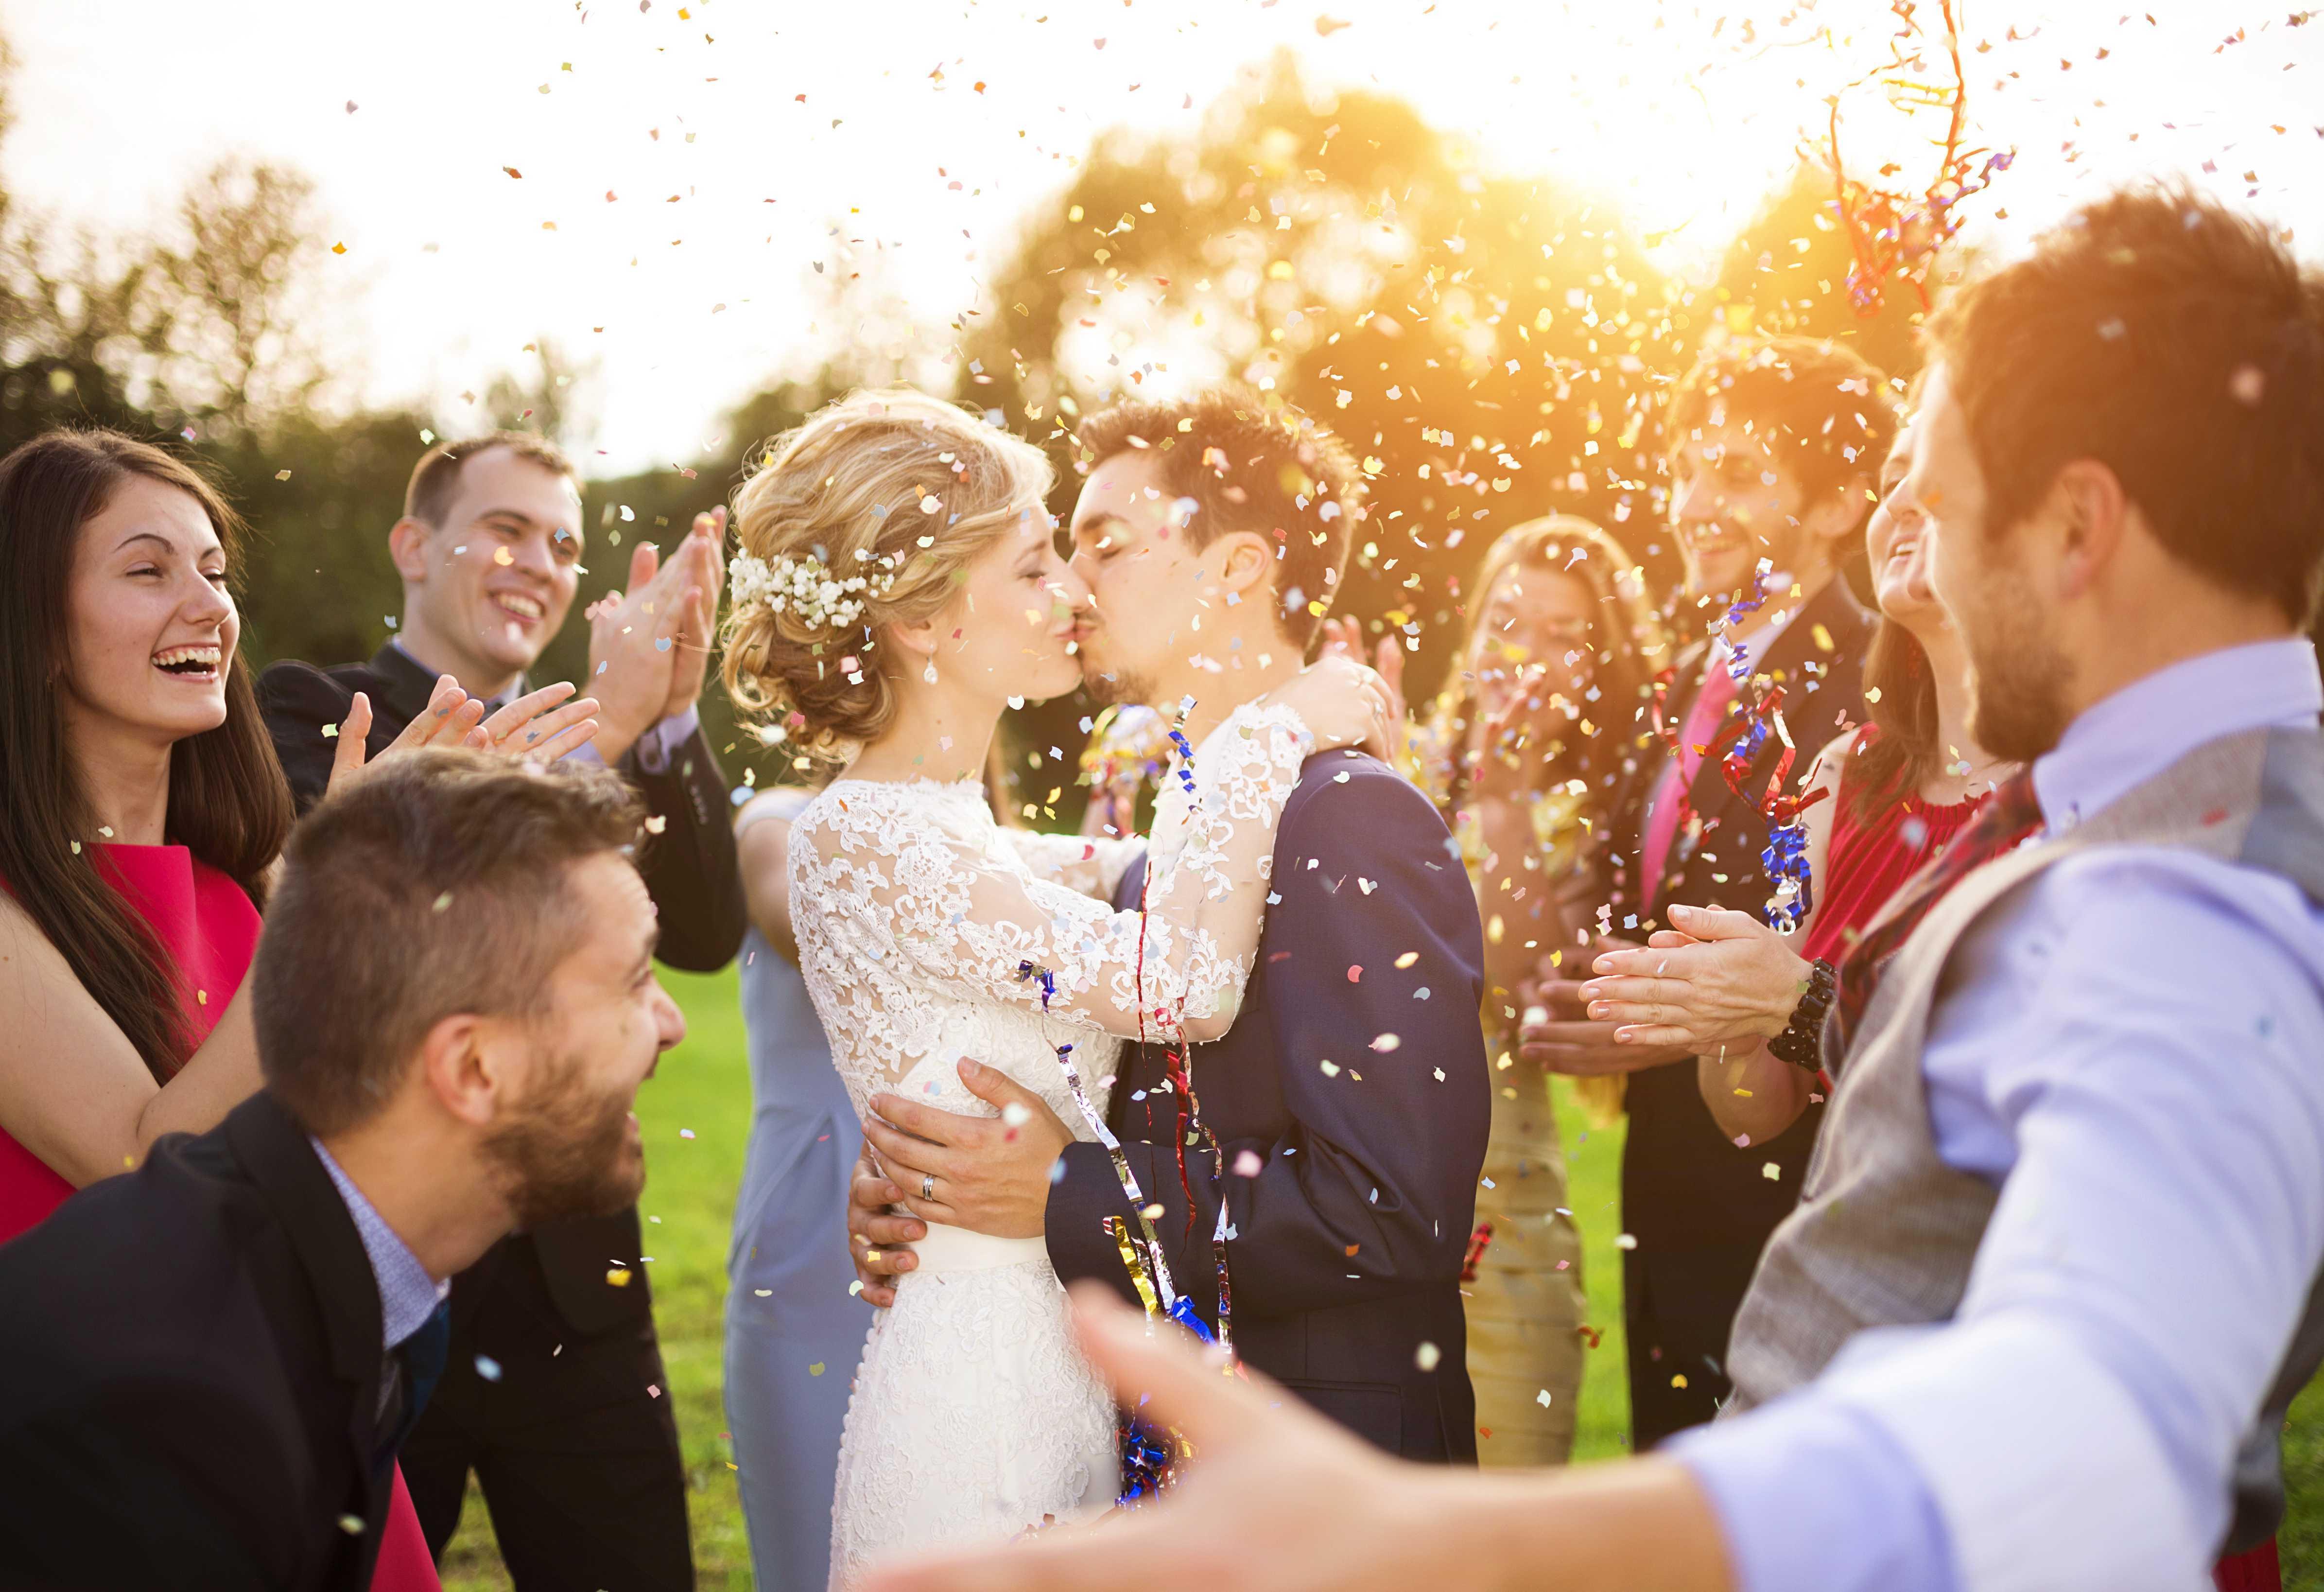 Big Day Secrets: Making Your Wedding Memorable